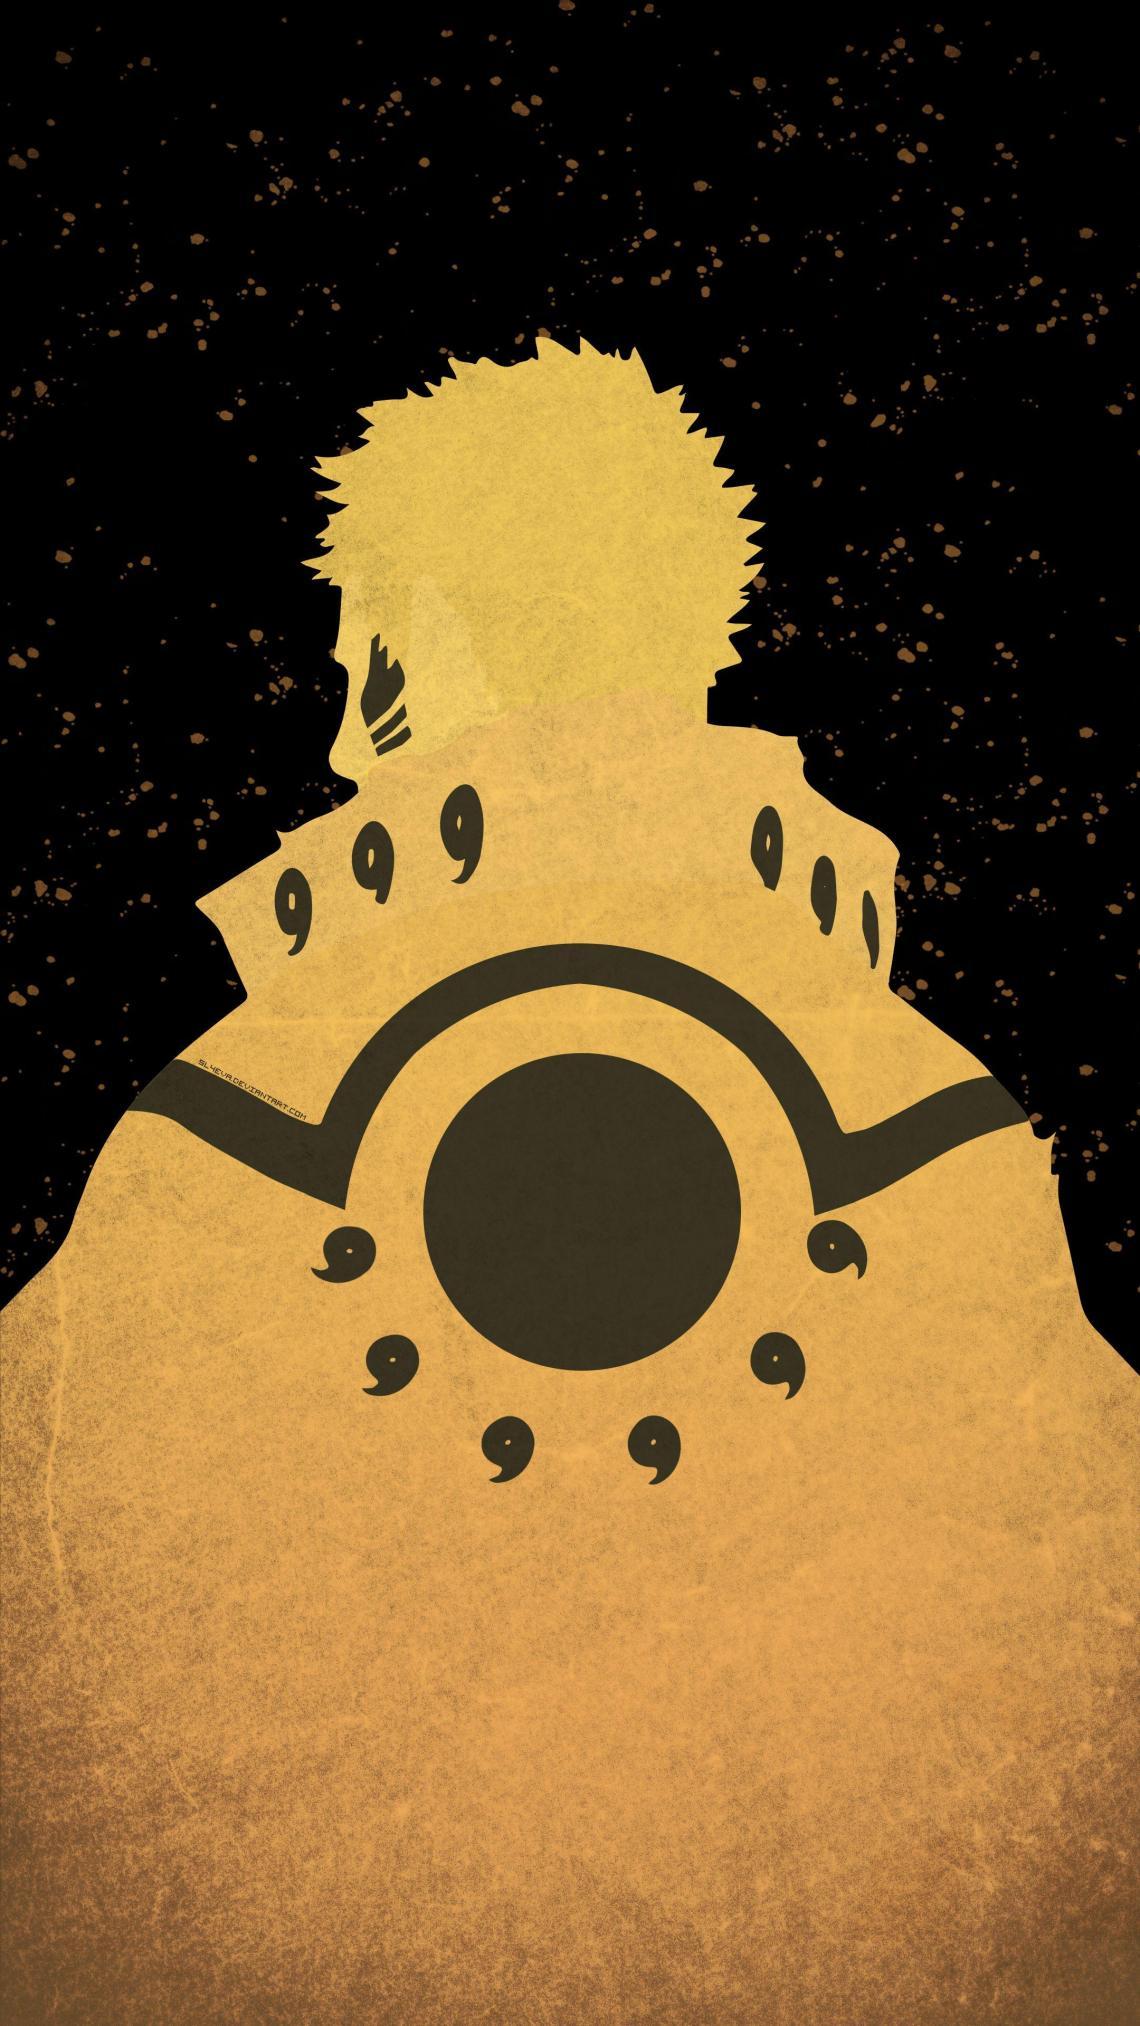 Naruto Anime Phone Wallpapers Top Free Naruto Anime Phone Backgrounds Wallpaperaccess